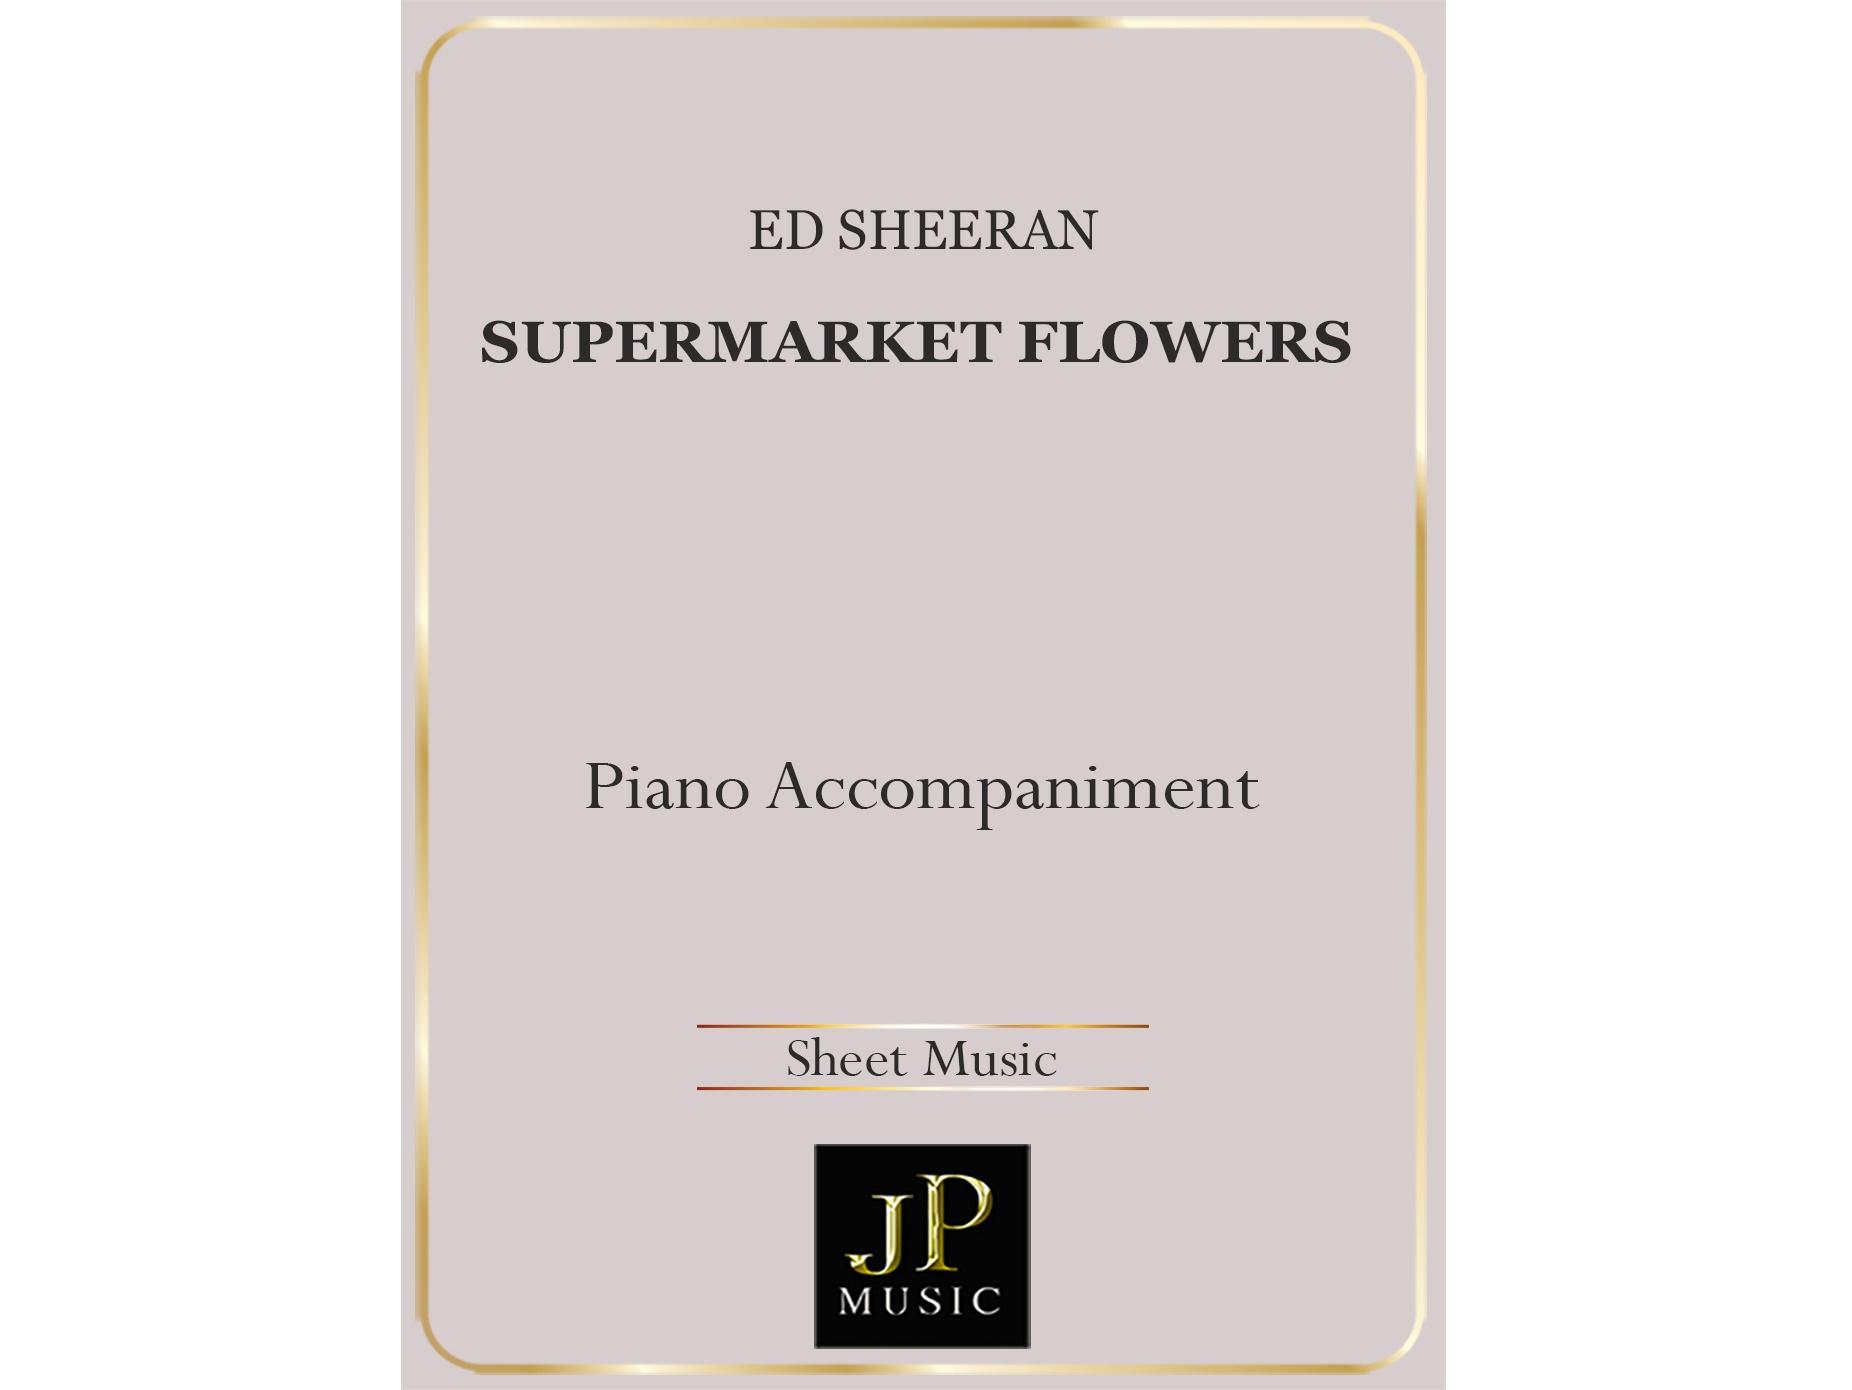 Supermarket Flowers - Piano Accompaniment